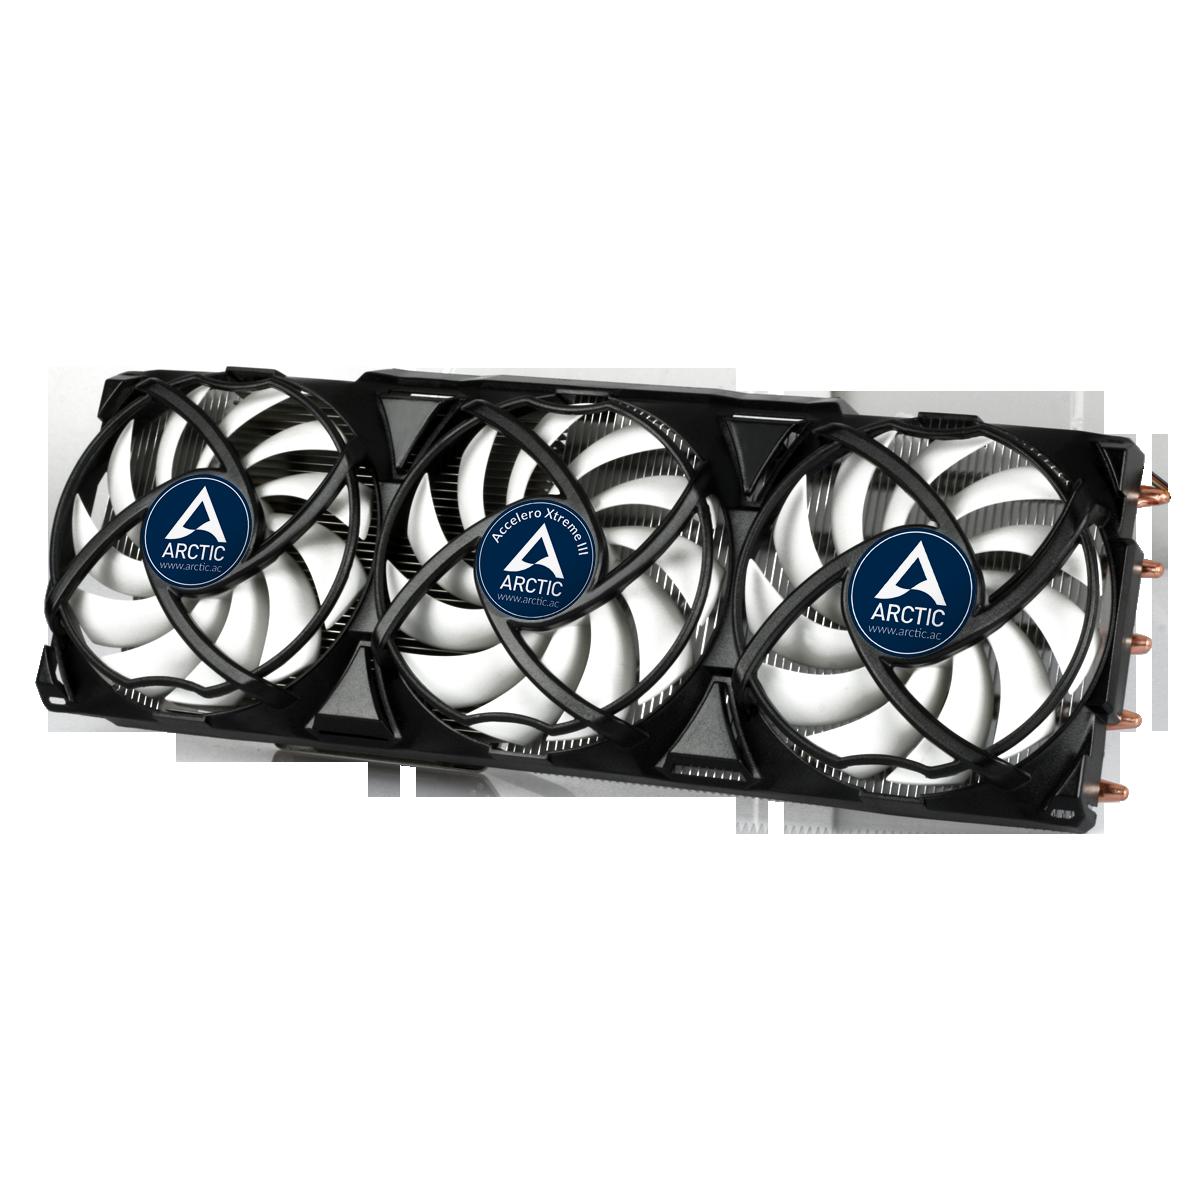 High-End VGA Cooler for AMD/NVIDIA ARCTIC Accelero Xtreme III